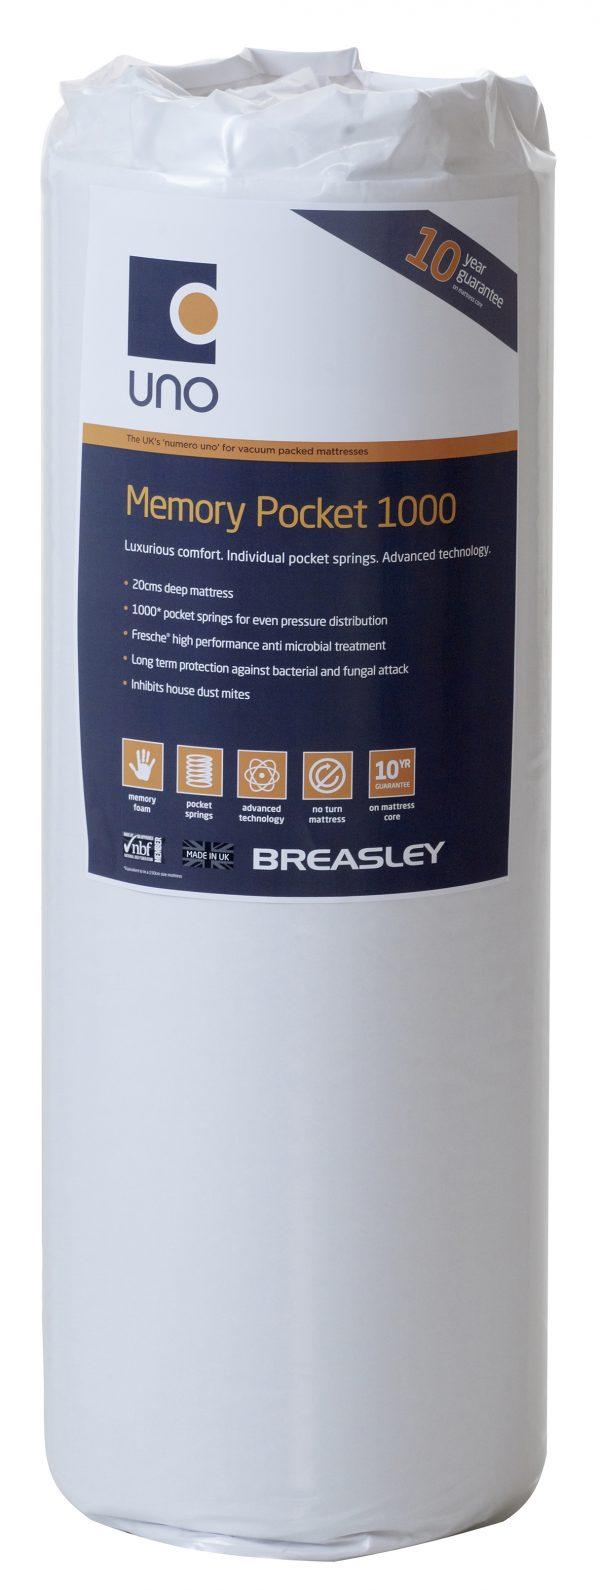 Breasley Caress Memory Pocket 1000